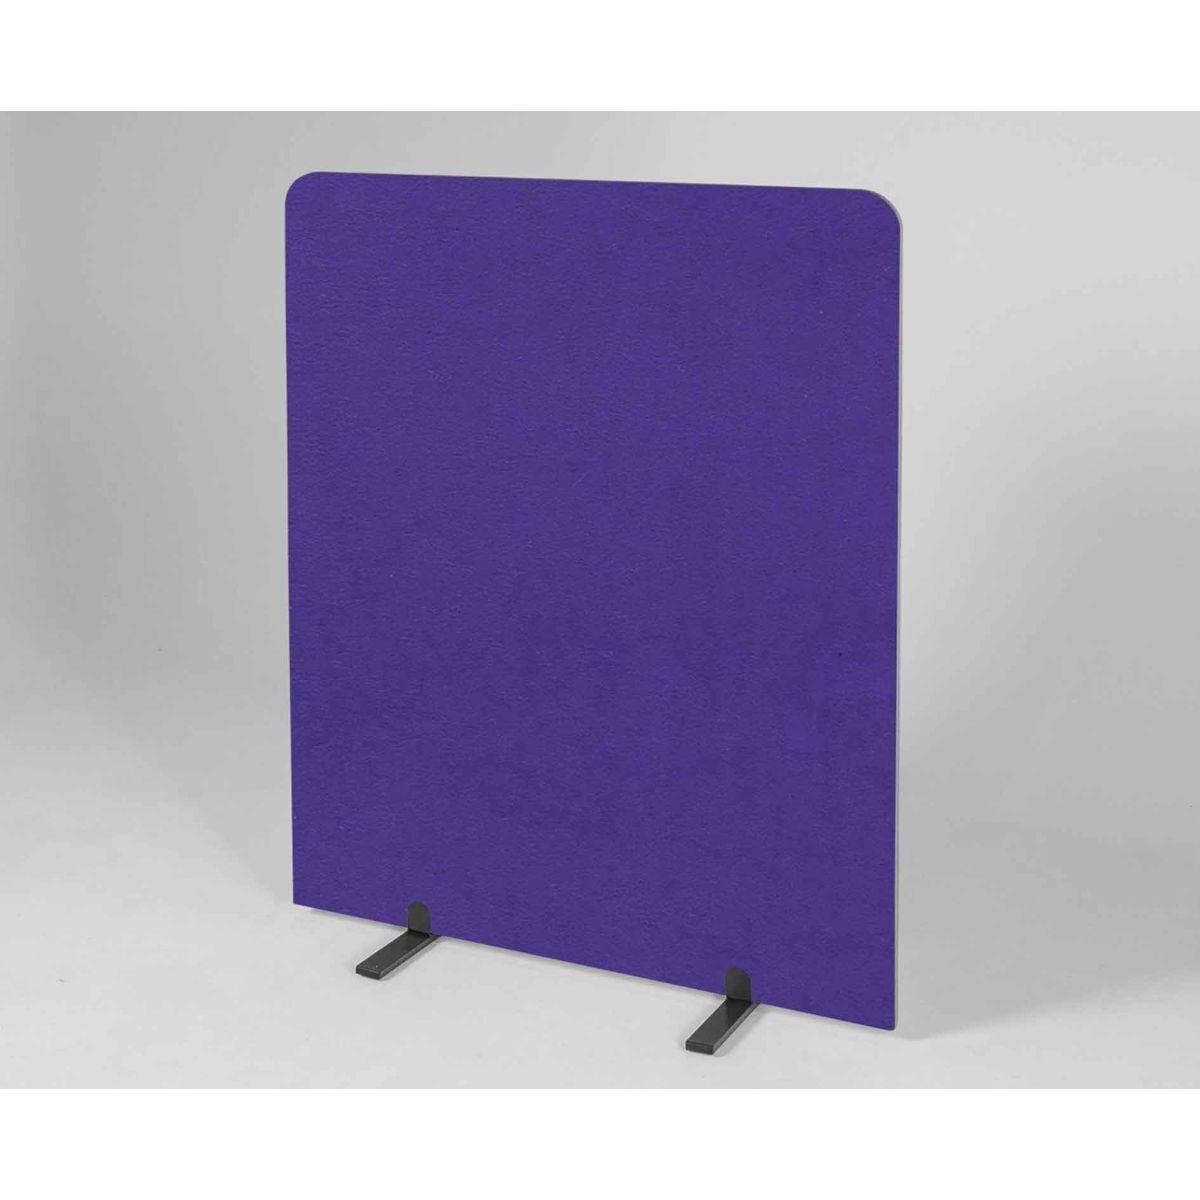 Metroplan BusyScreen Curve Screen 1450 x 1200mm Purple